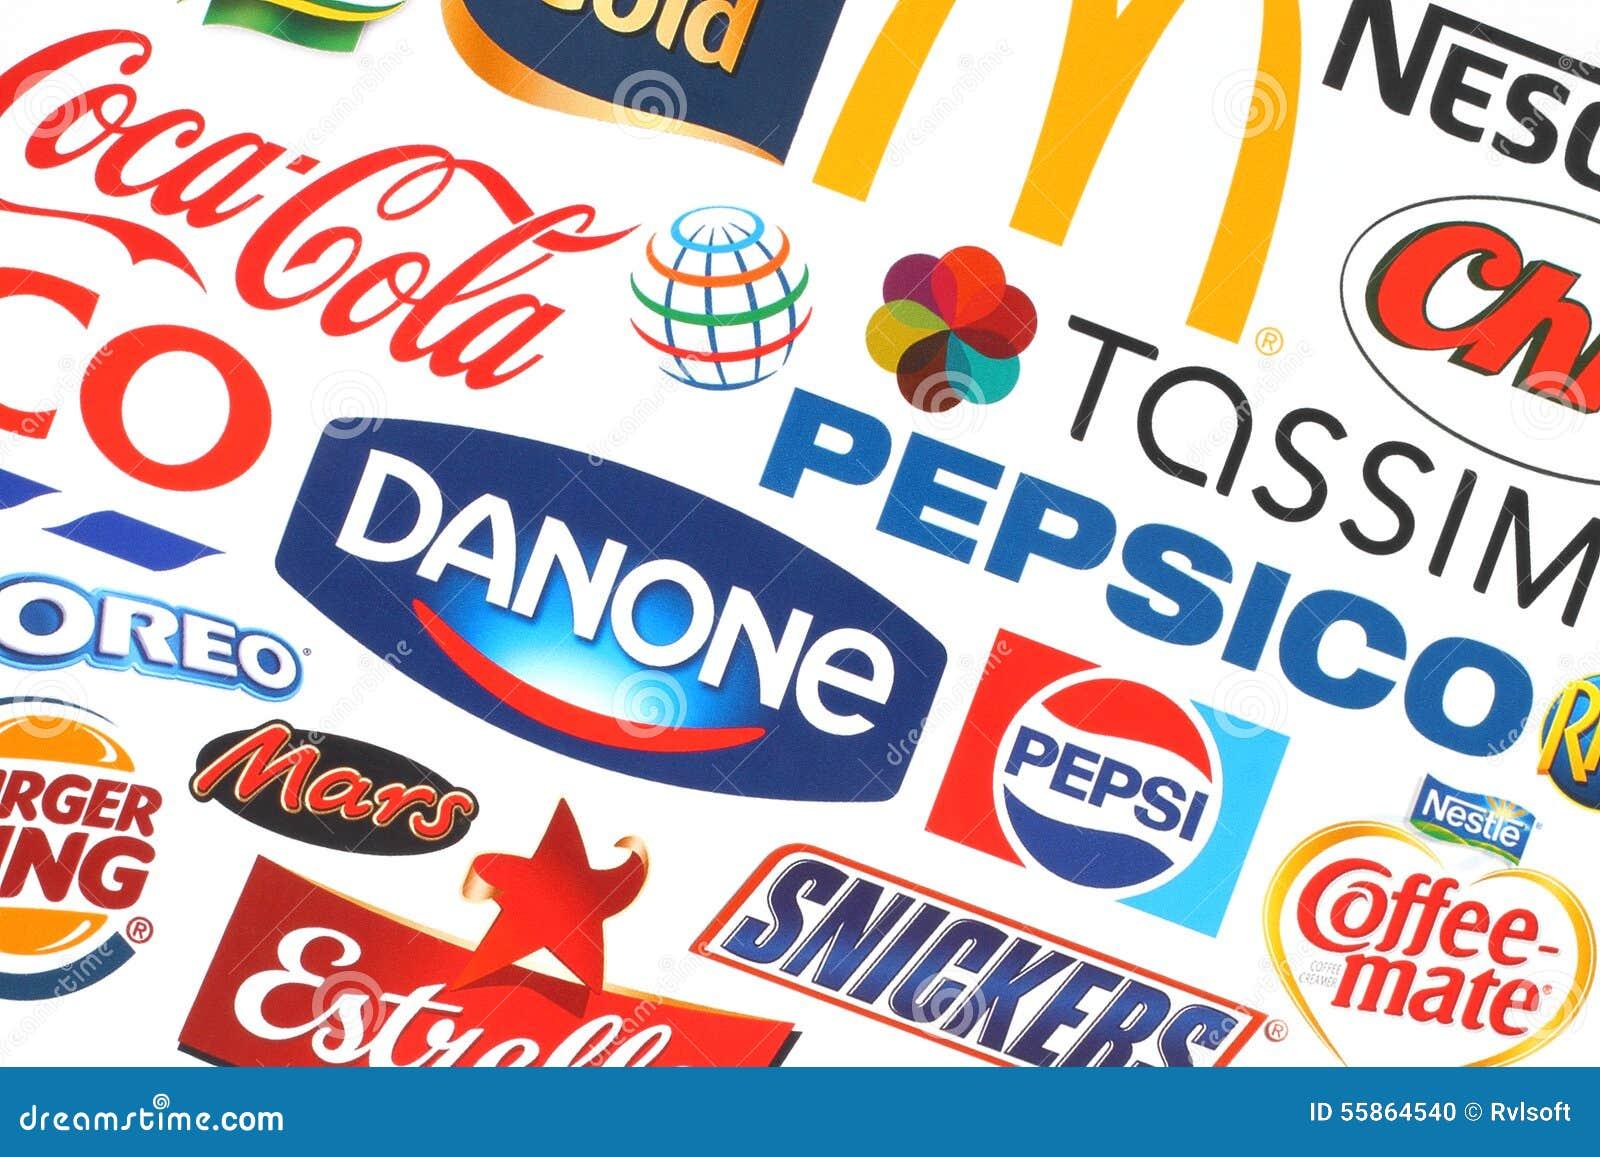 Collection of popular food logos companies